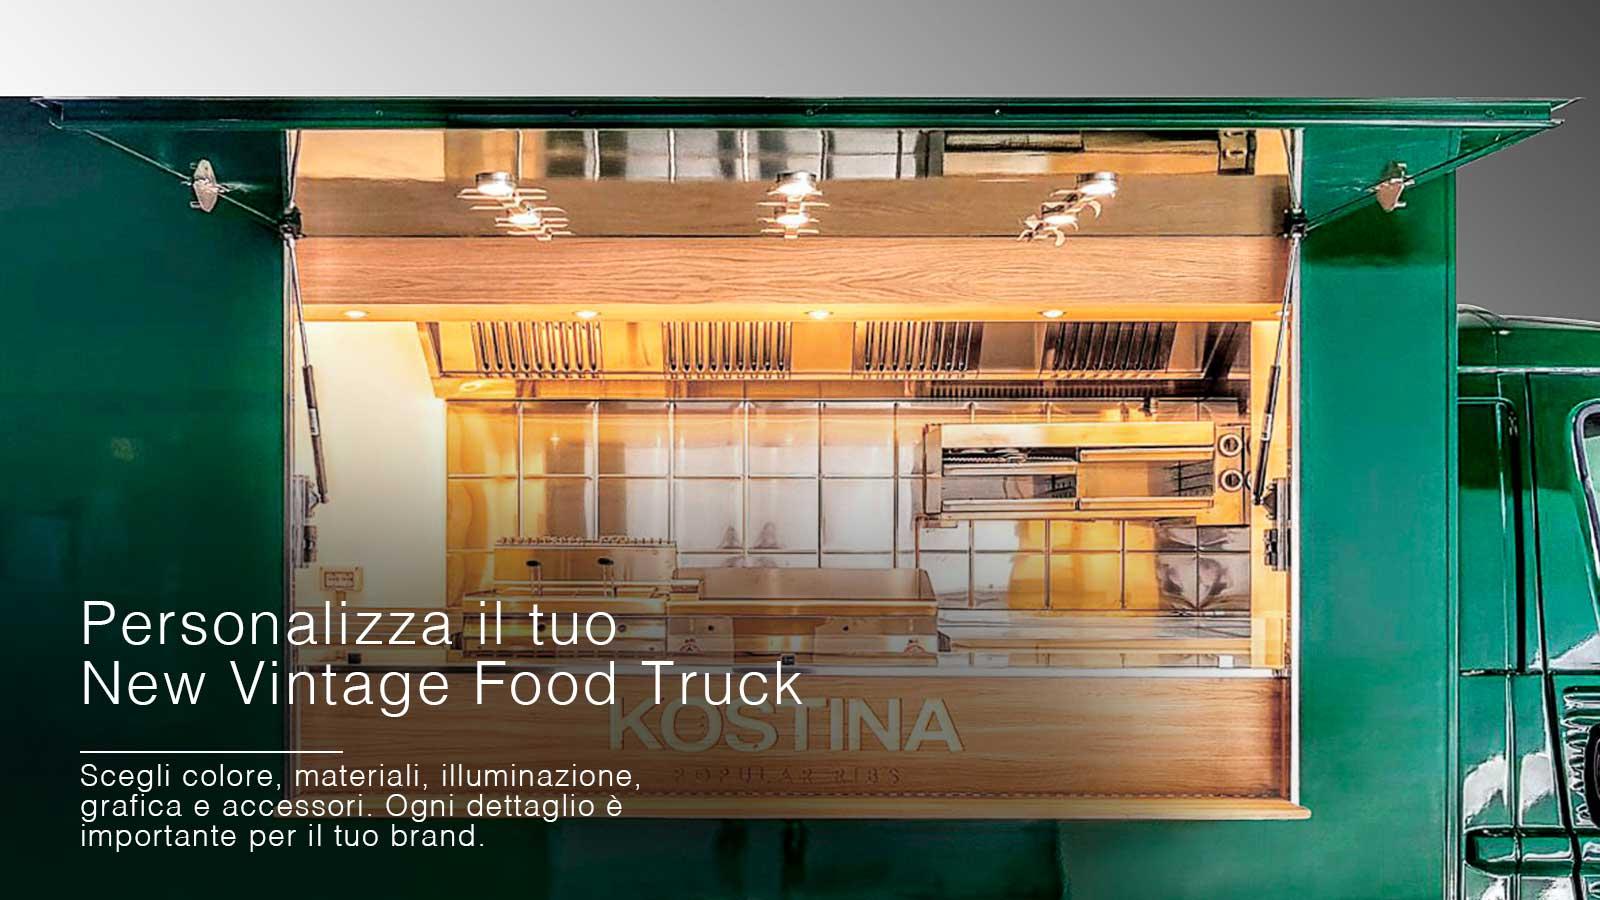 food truck vintage citroen nuova versione del veicolo d'epoca